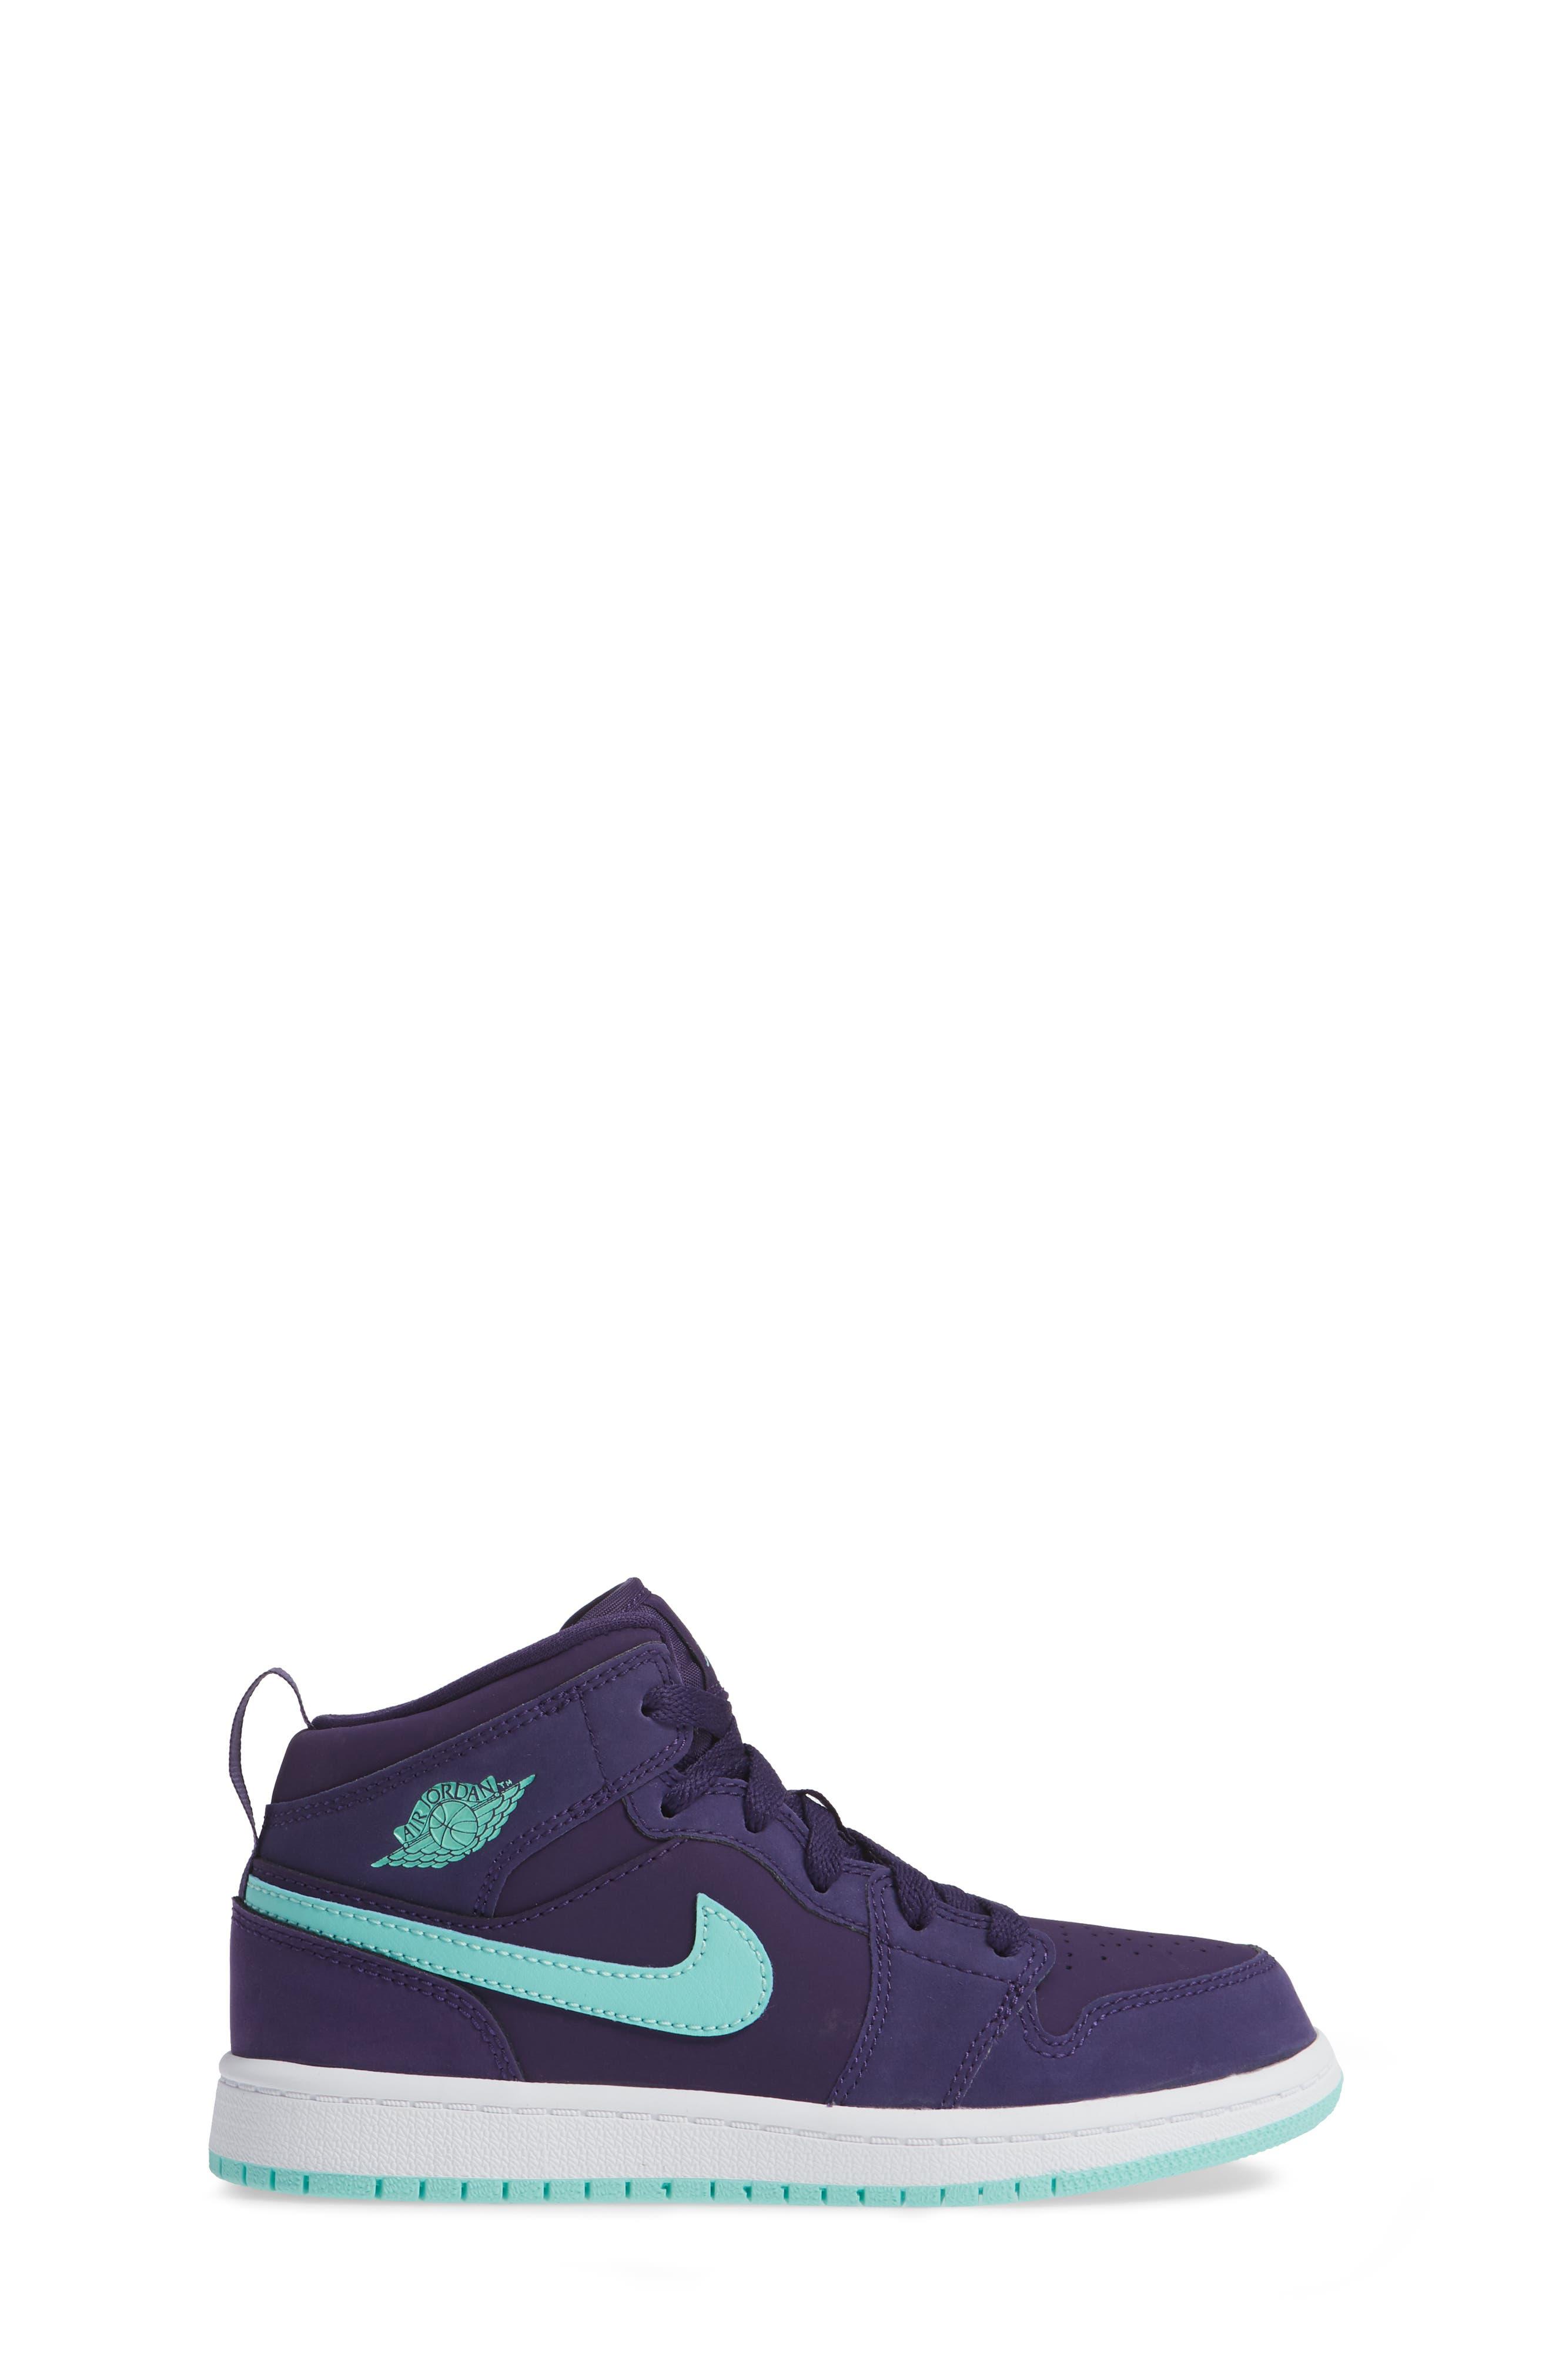 Nike 'Jordan 1 Mid' Basketball Shoe,                             Alternate thumbnail 3, color,                             Ink/ Emerald Rise/ White